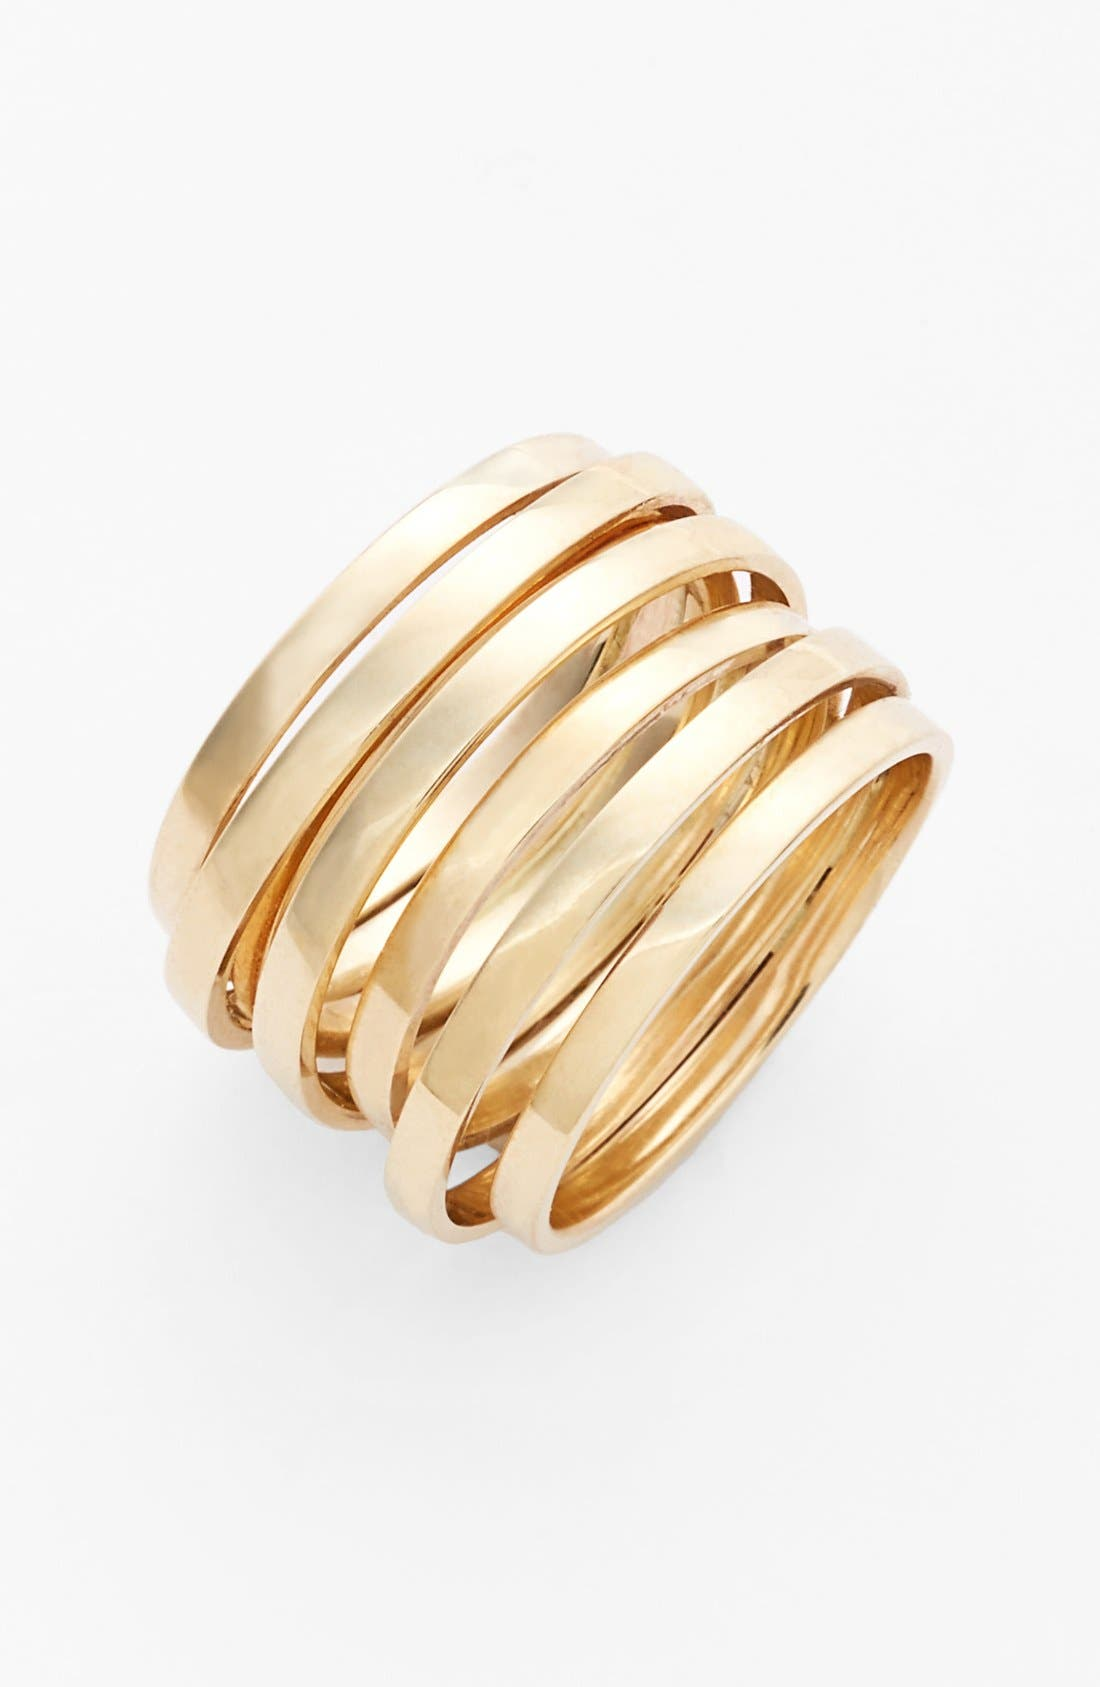 Main Image - Lana Jewelry Stack Ring